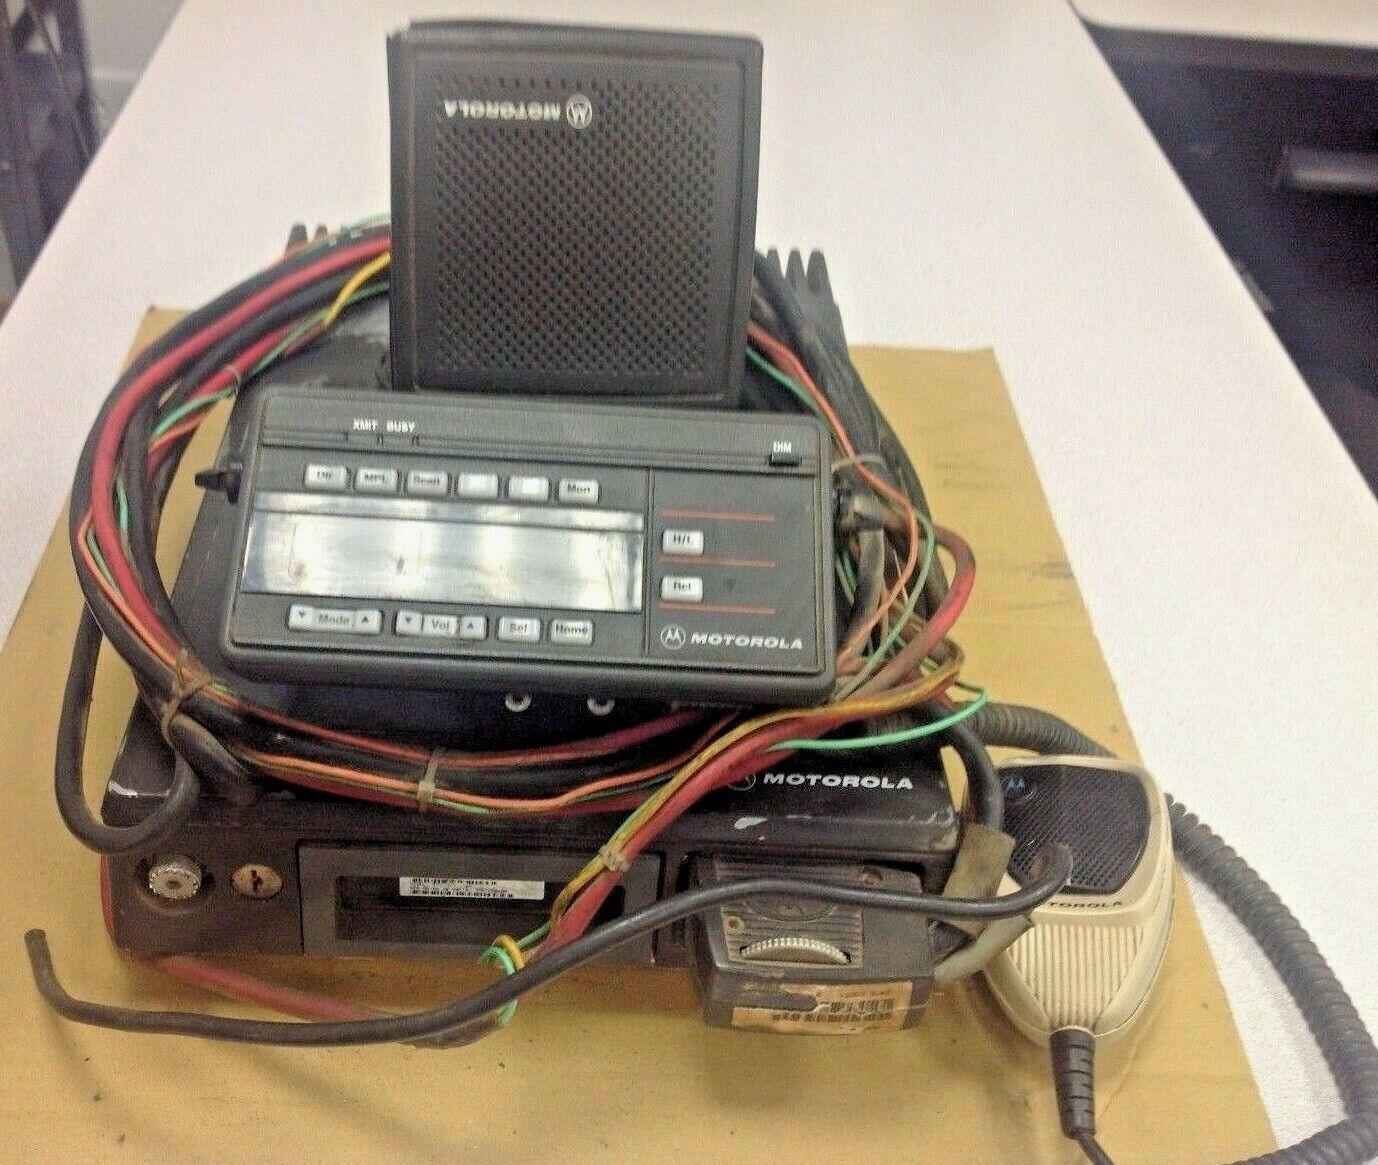 Vintage Motorola VHF 100W, MARATRAC,99 CH, Model T73XTA7TA7BK, Head, Speaker,MIC. Buy it now for 340.00